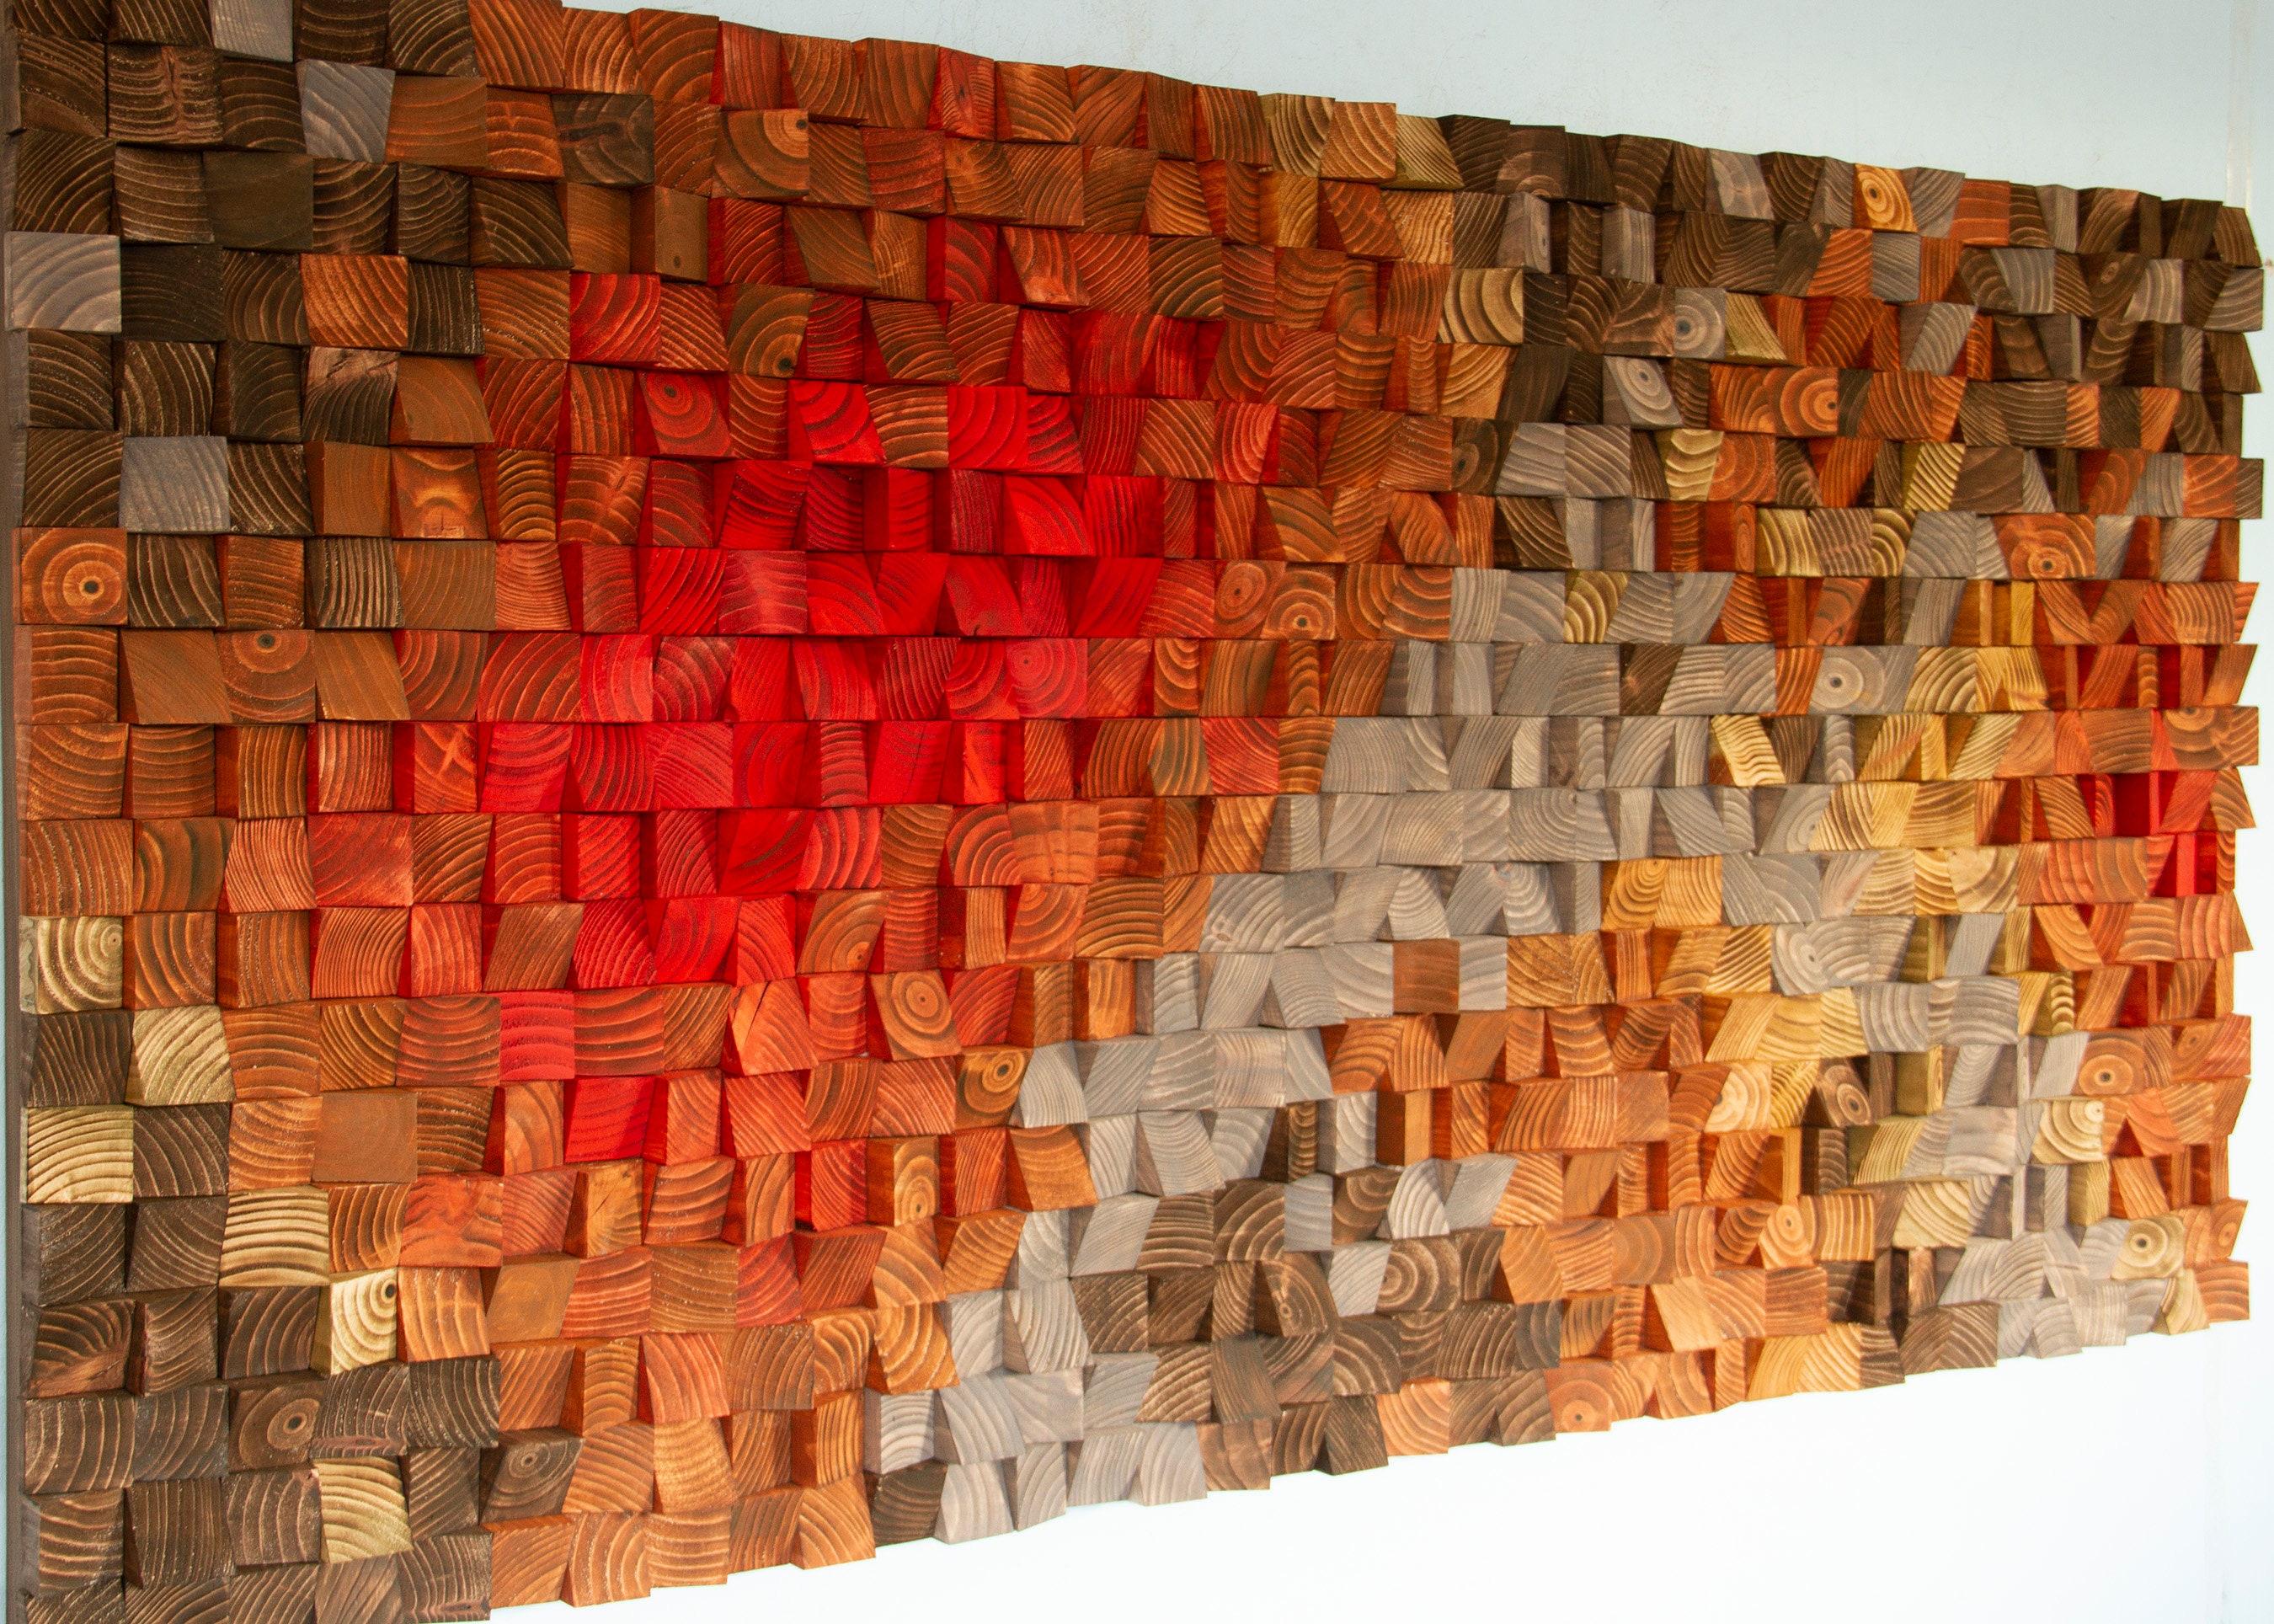 Rustic Wood Wall Art Reclaimed Wood Art 3d Wall Art Decor Factory